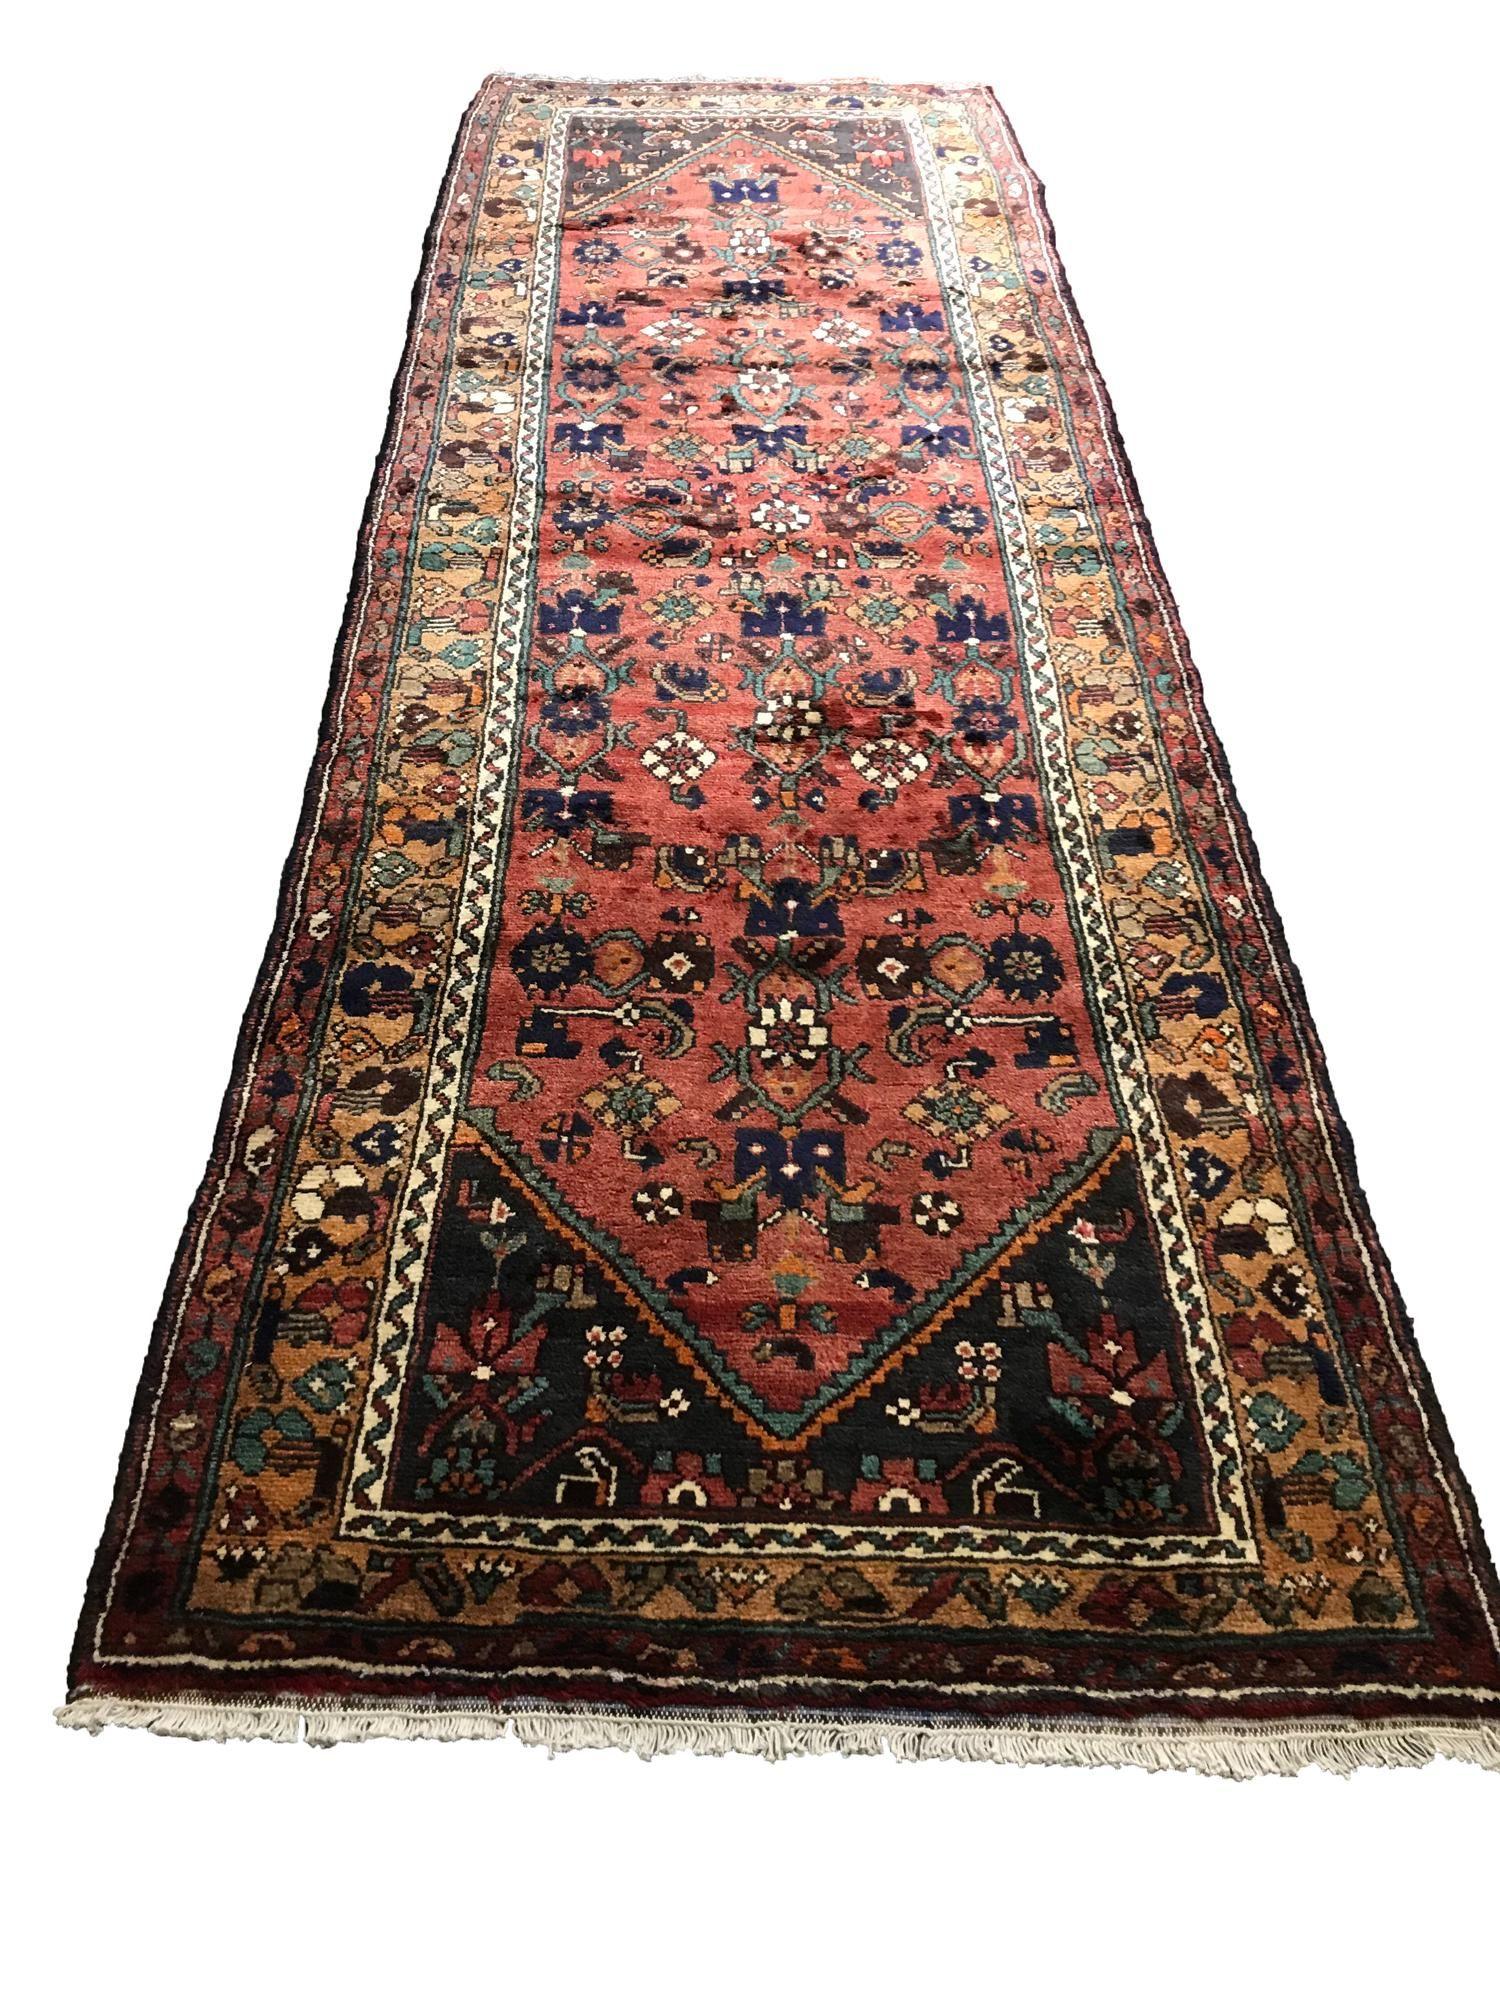 Persian kashan kh2401 fine antique wool pile rug hand